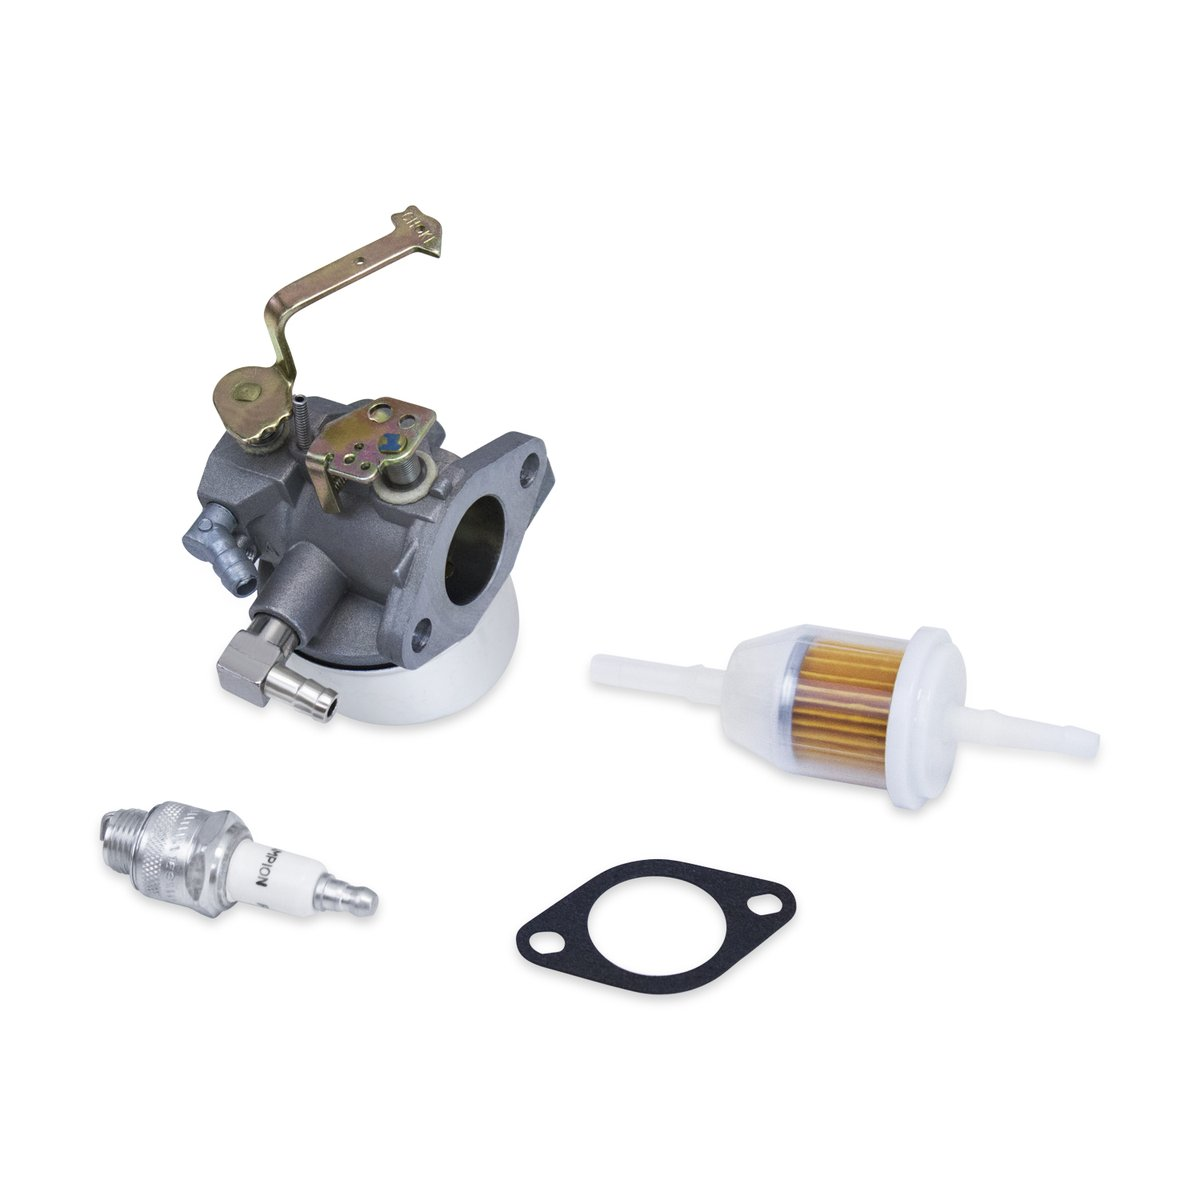 HV_7186] Fuel Filter For Tecumseh Hm100 Wiring DiagramTeria Vell Acion Ariot Lukep Romet Hapolo Mohammedshrine Librar Wiring 101